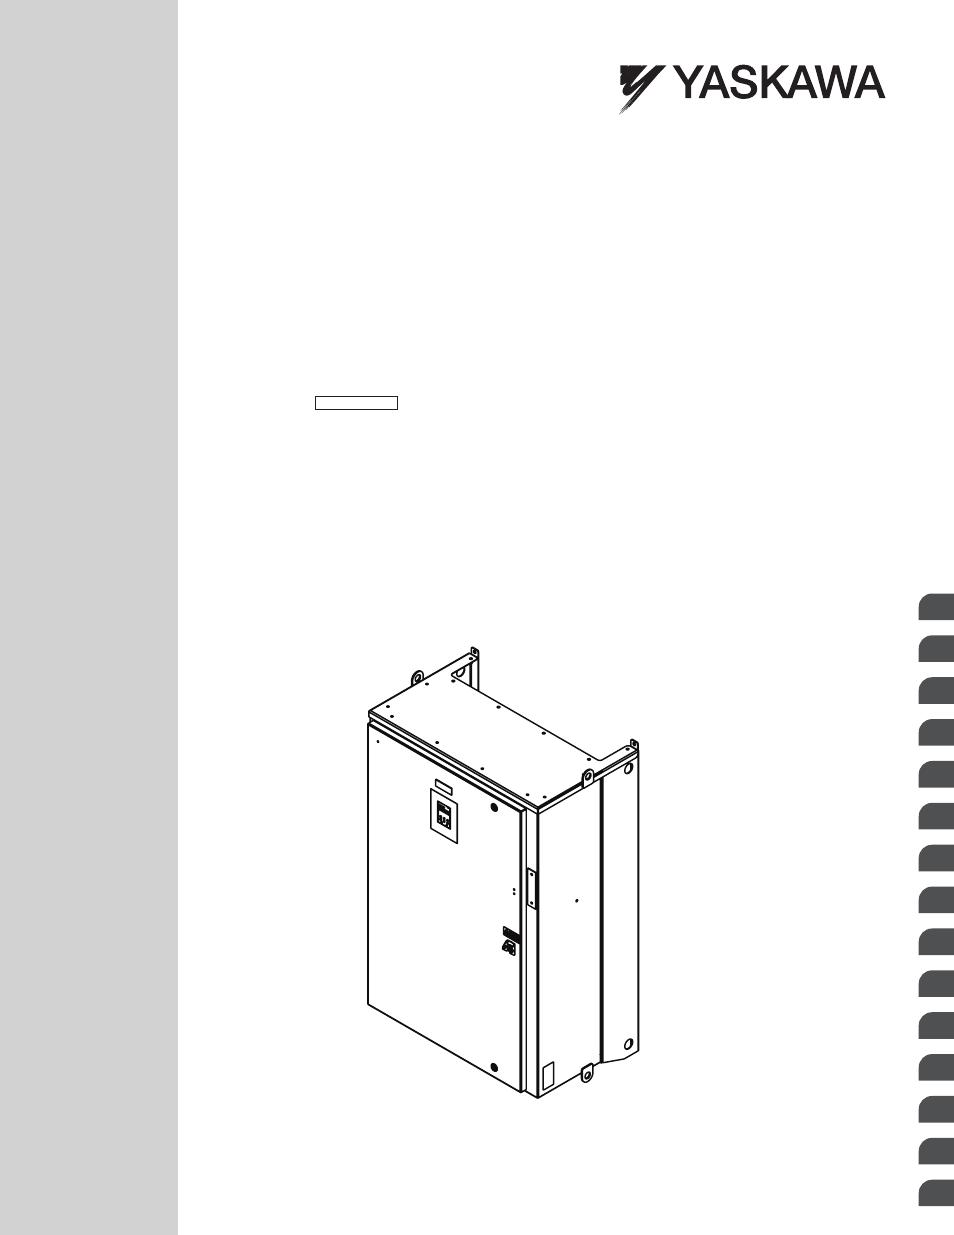 yaskawa ac drive p1000 bypass technical manual user manual